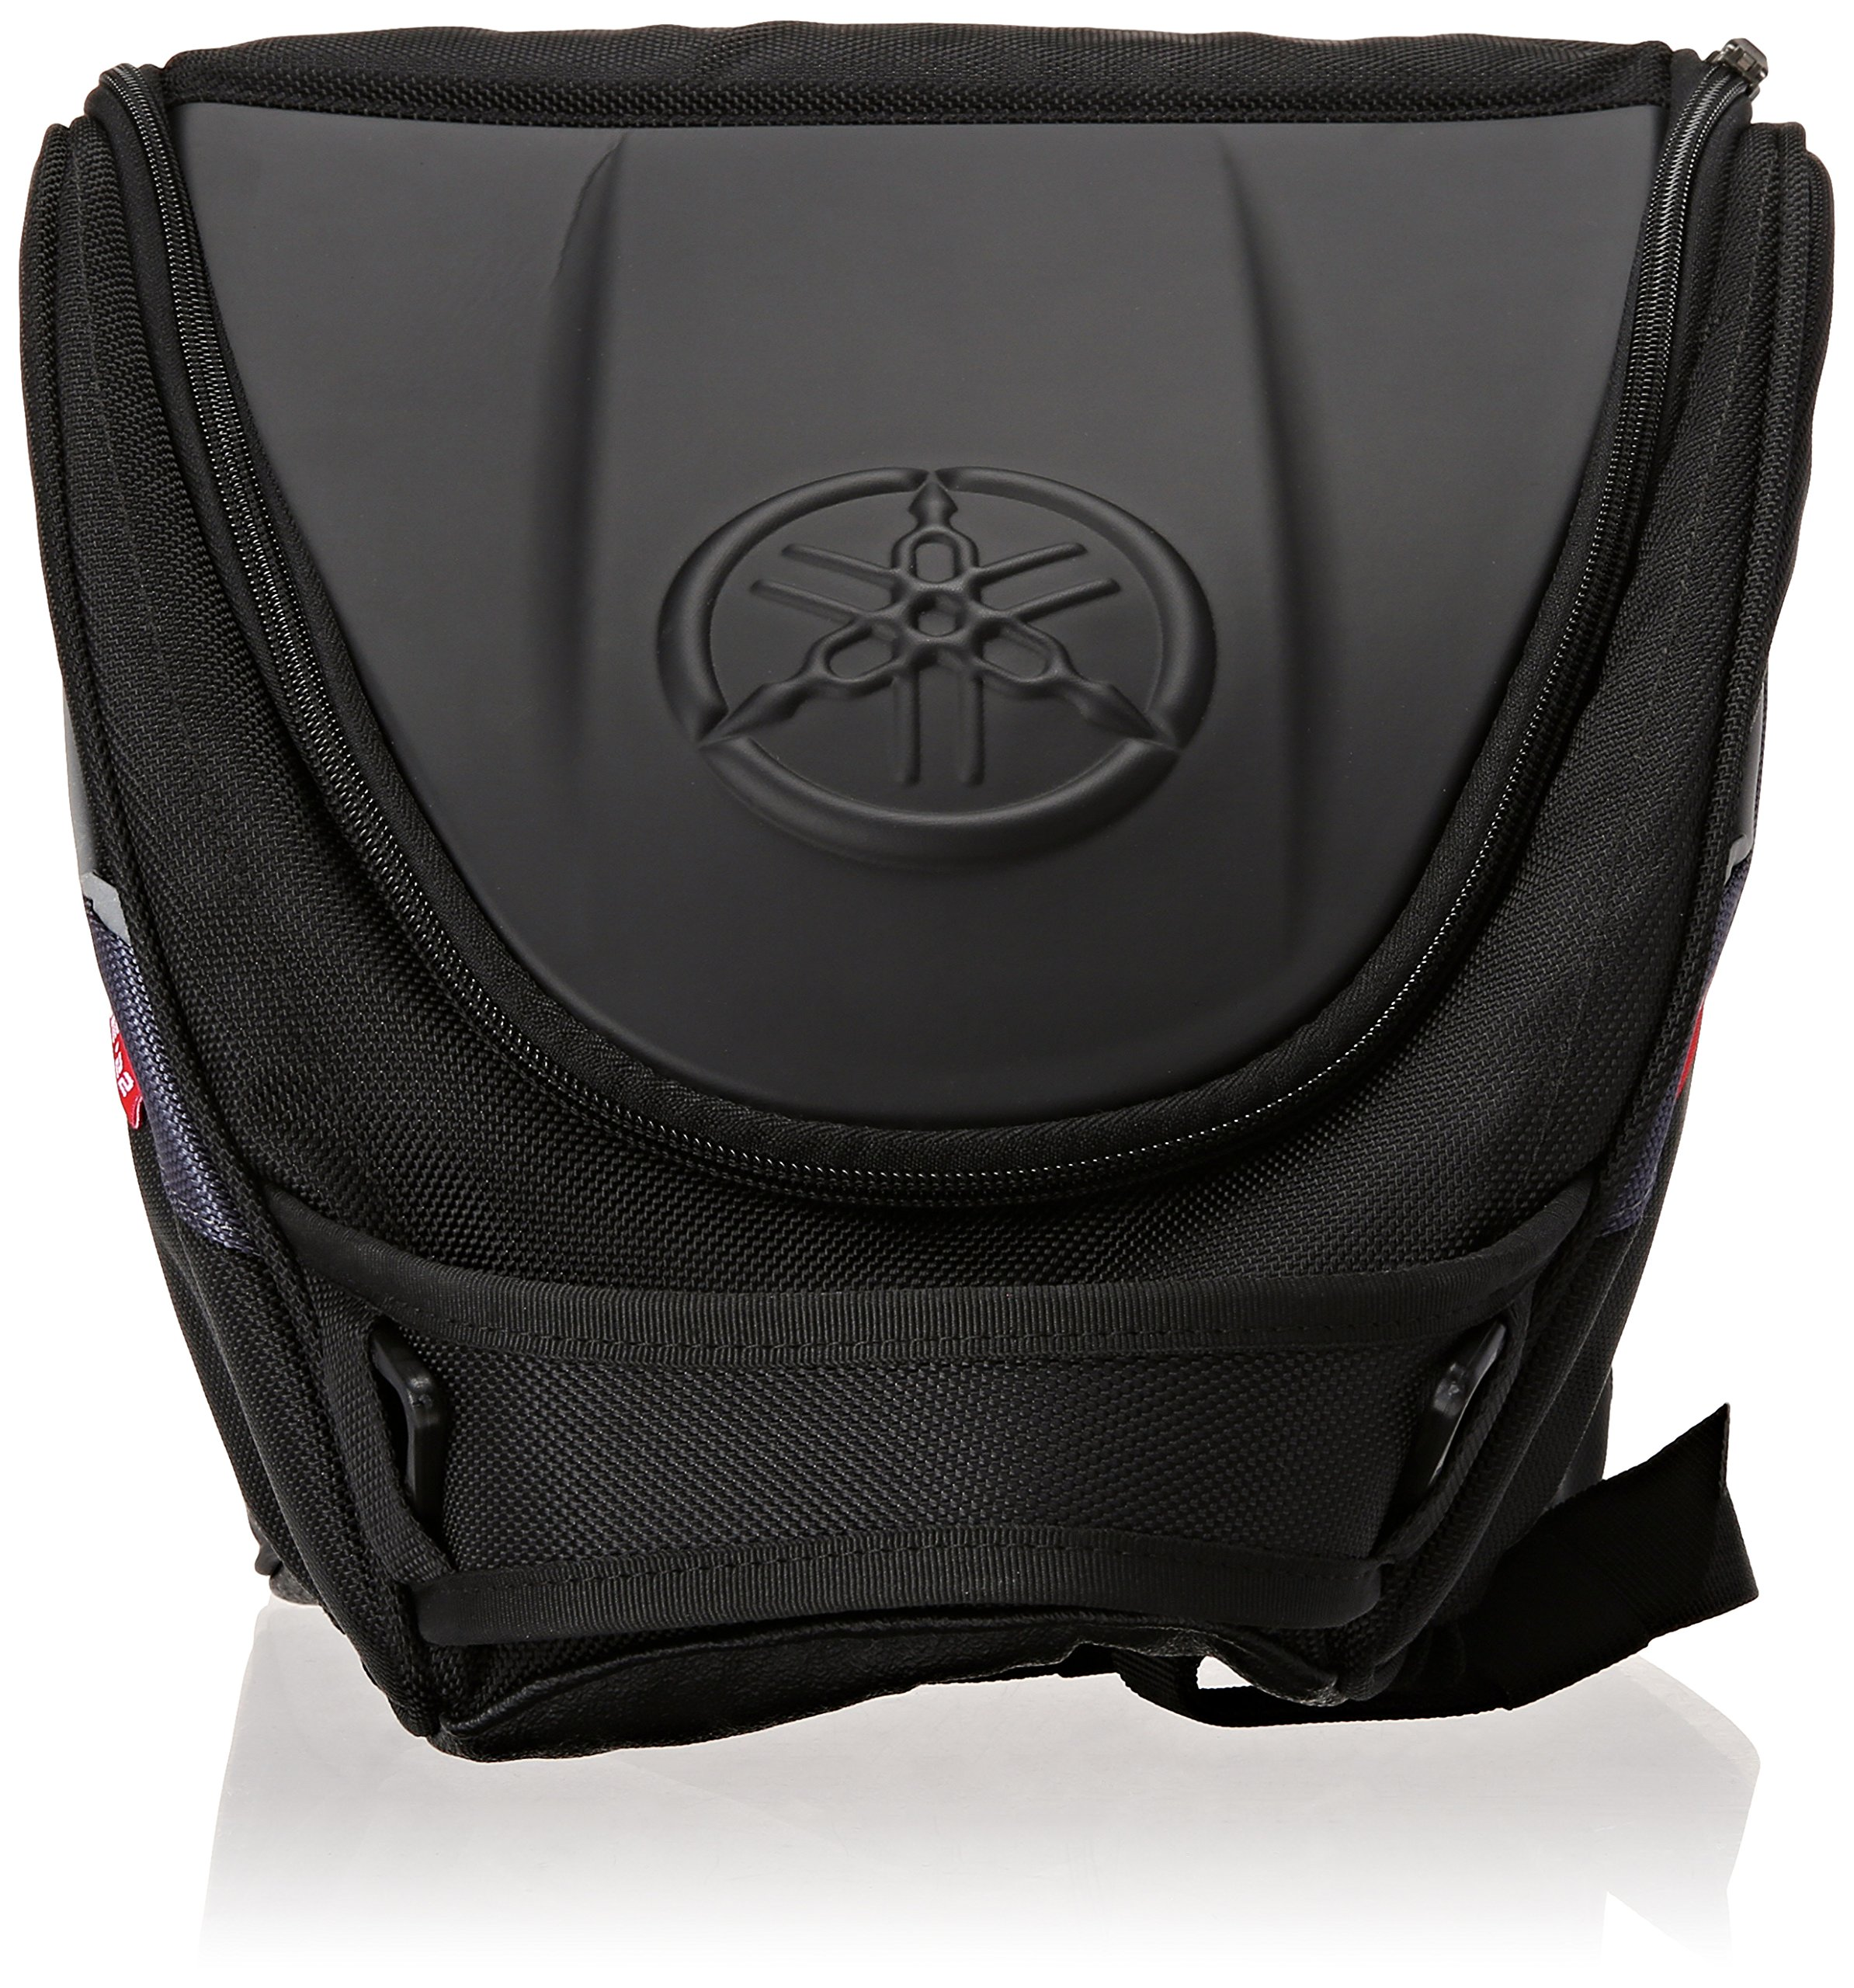 Yamaha 4B5-W0750-00-00 Console Bag for TMAX